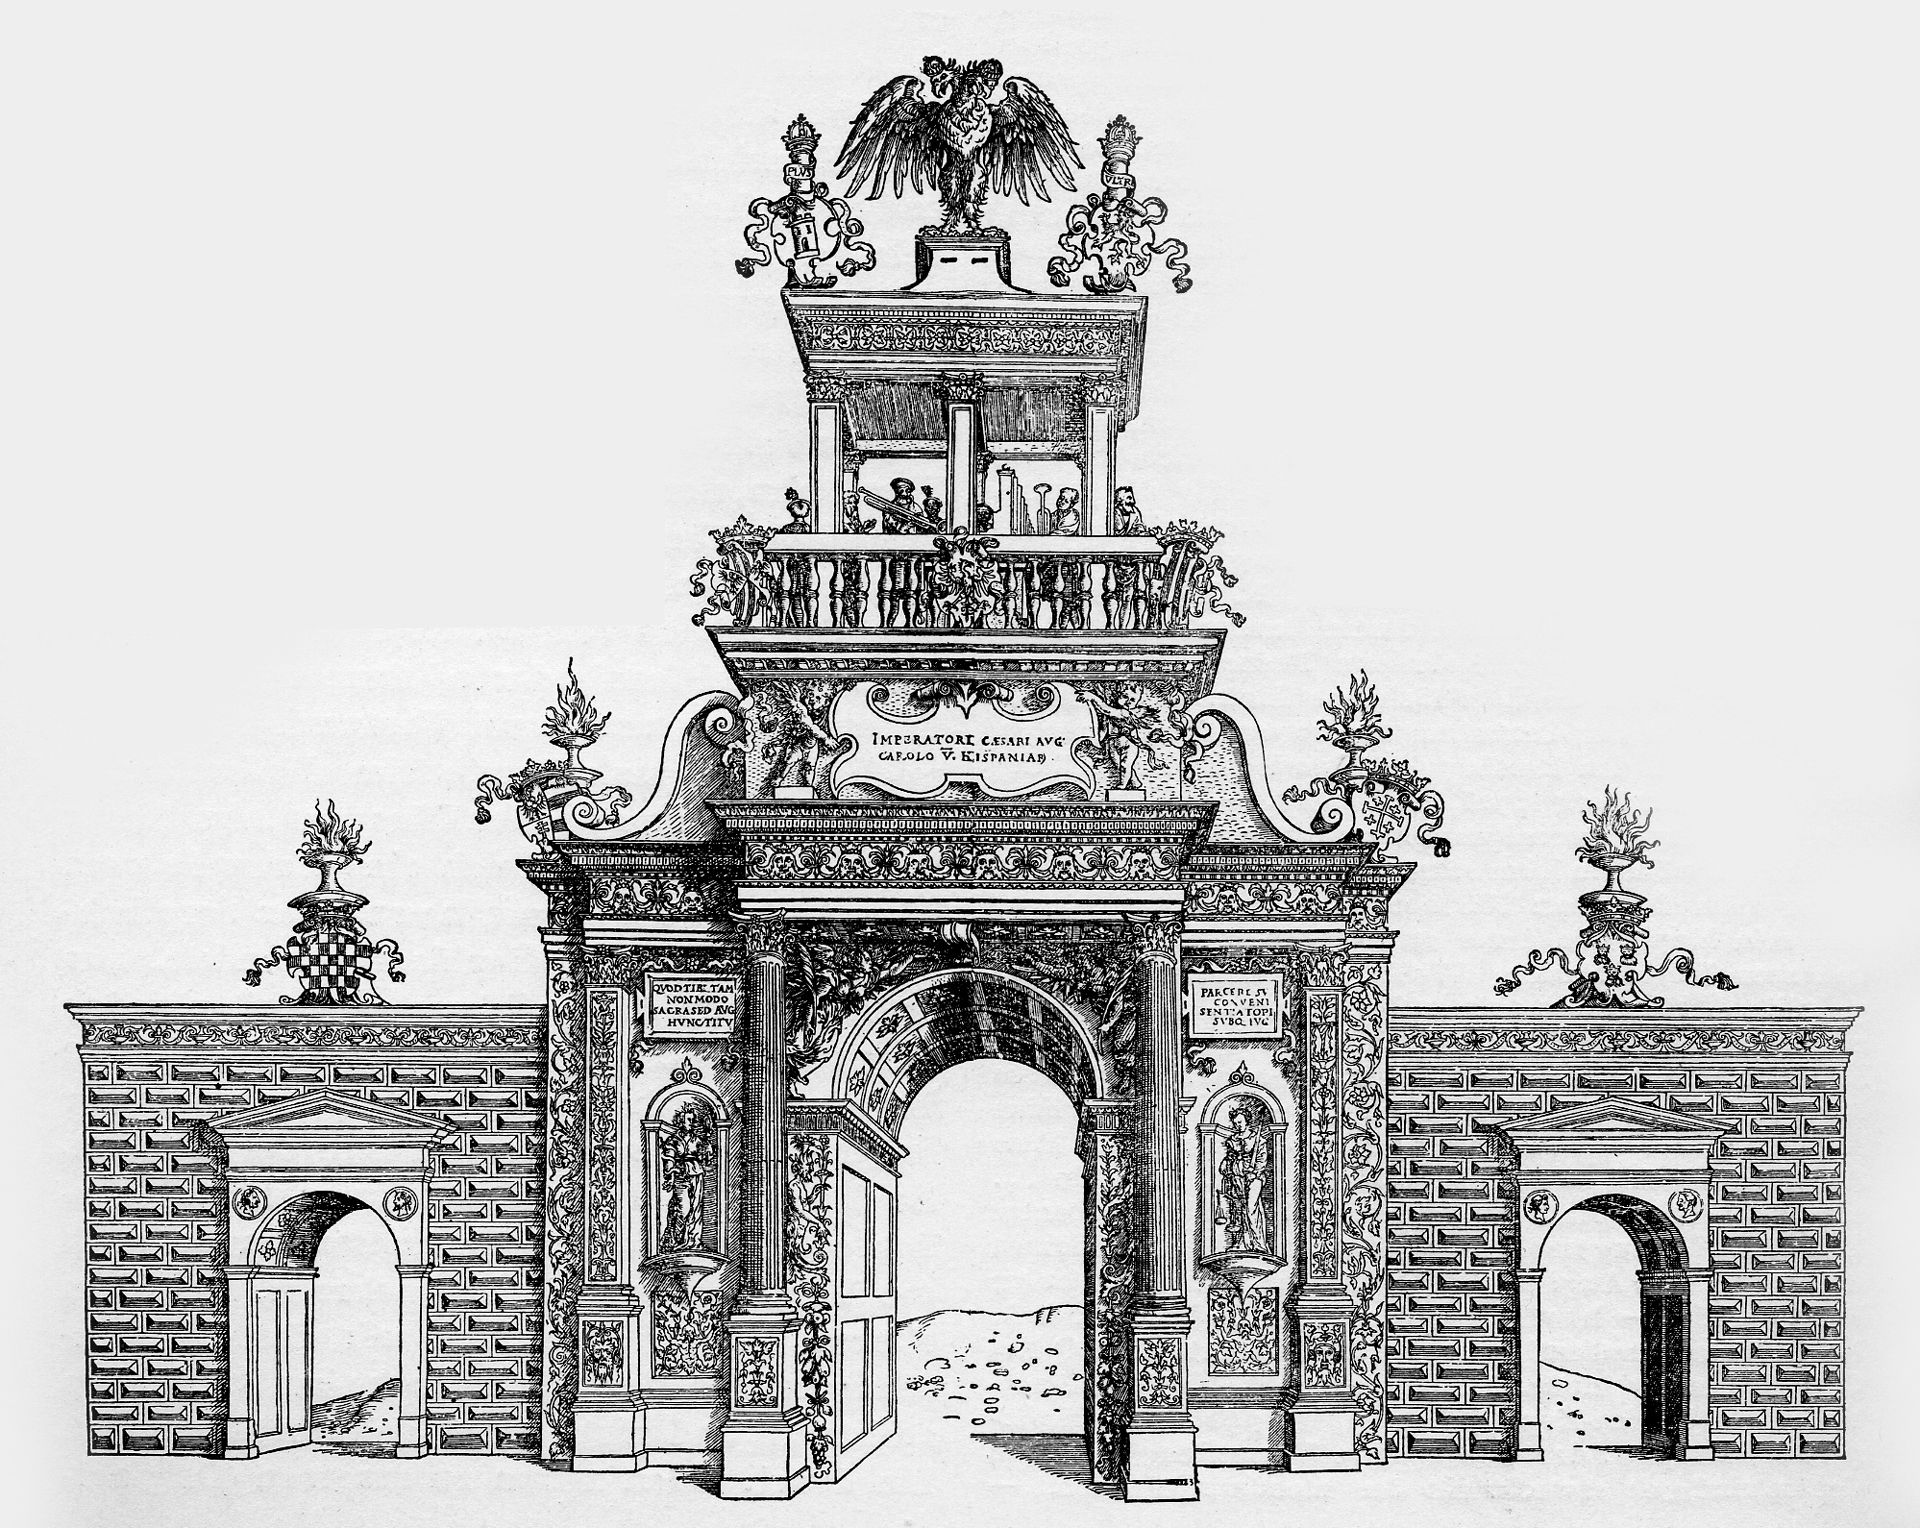 Ehrenpforte für Karl V. Ehrenpforte für Karl V.